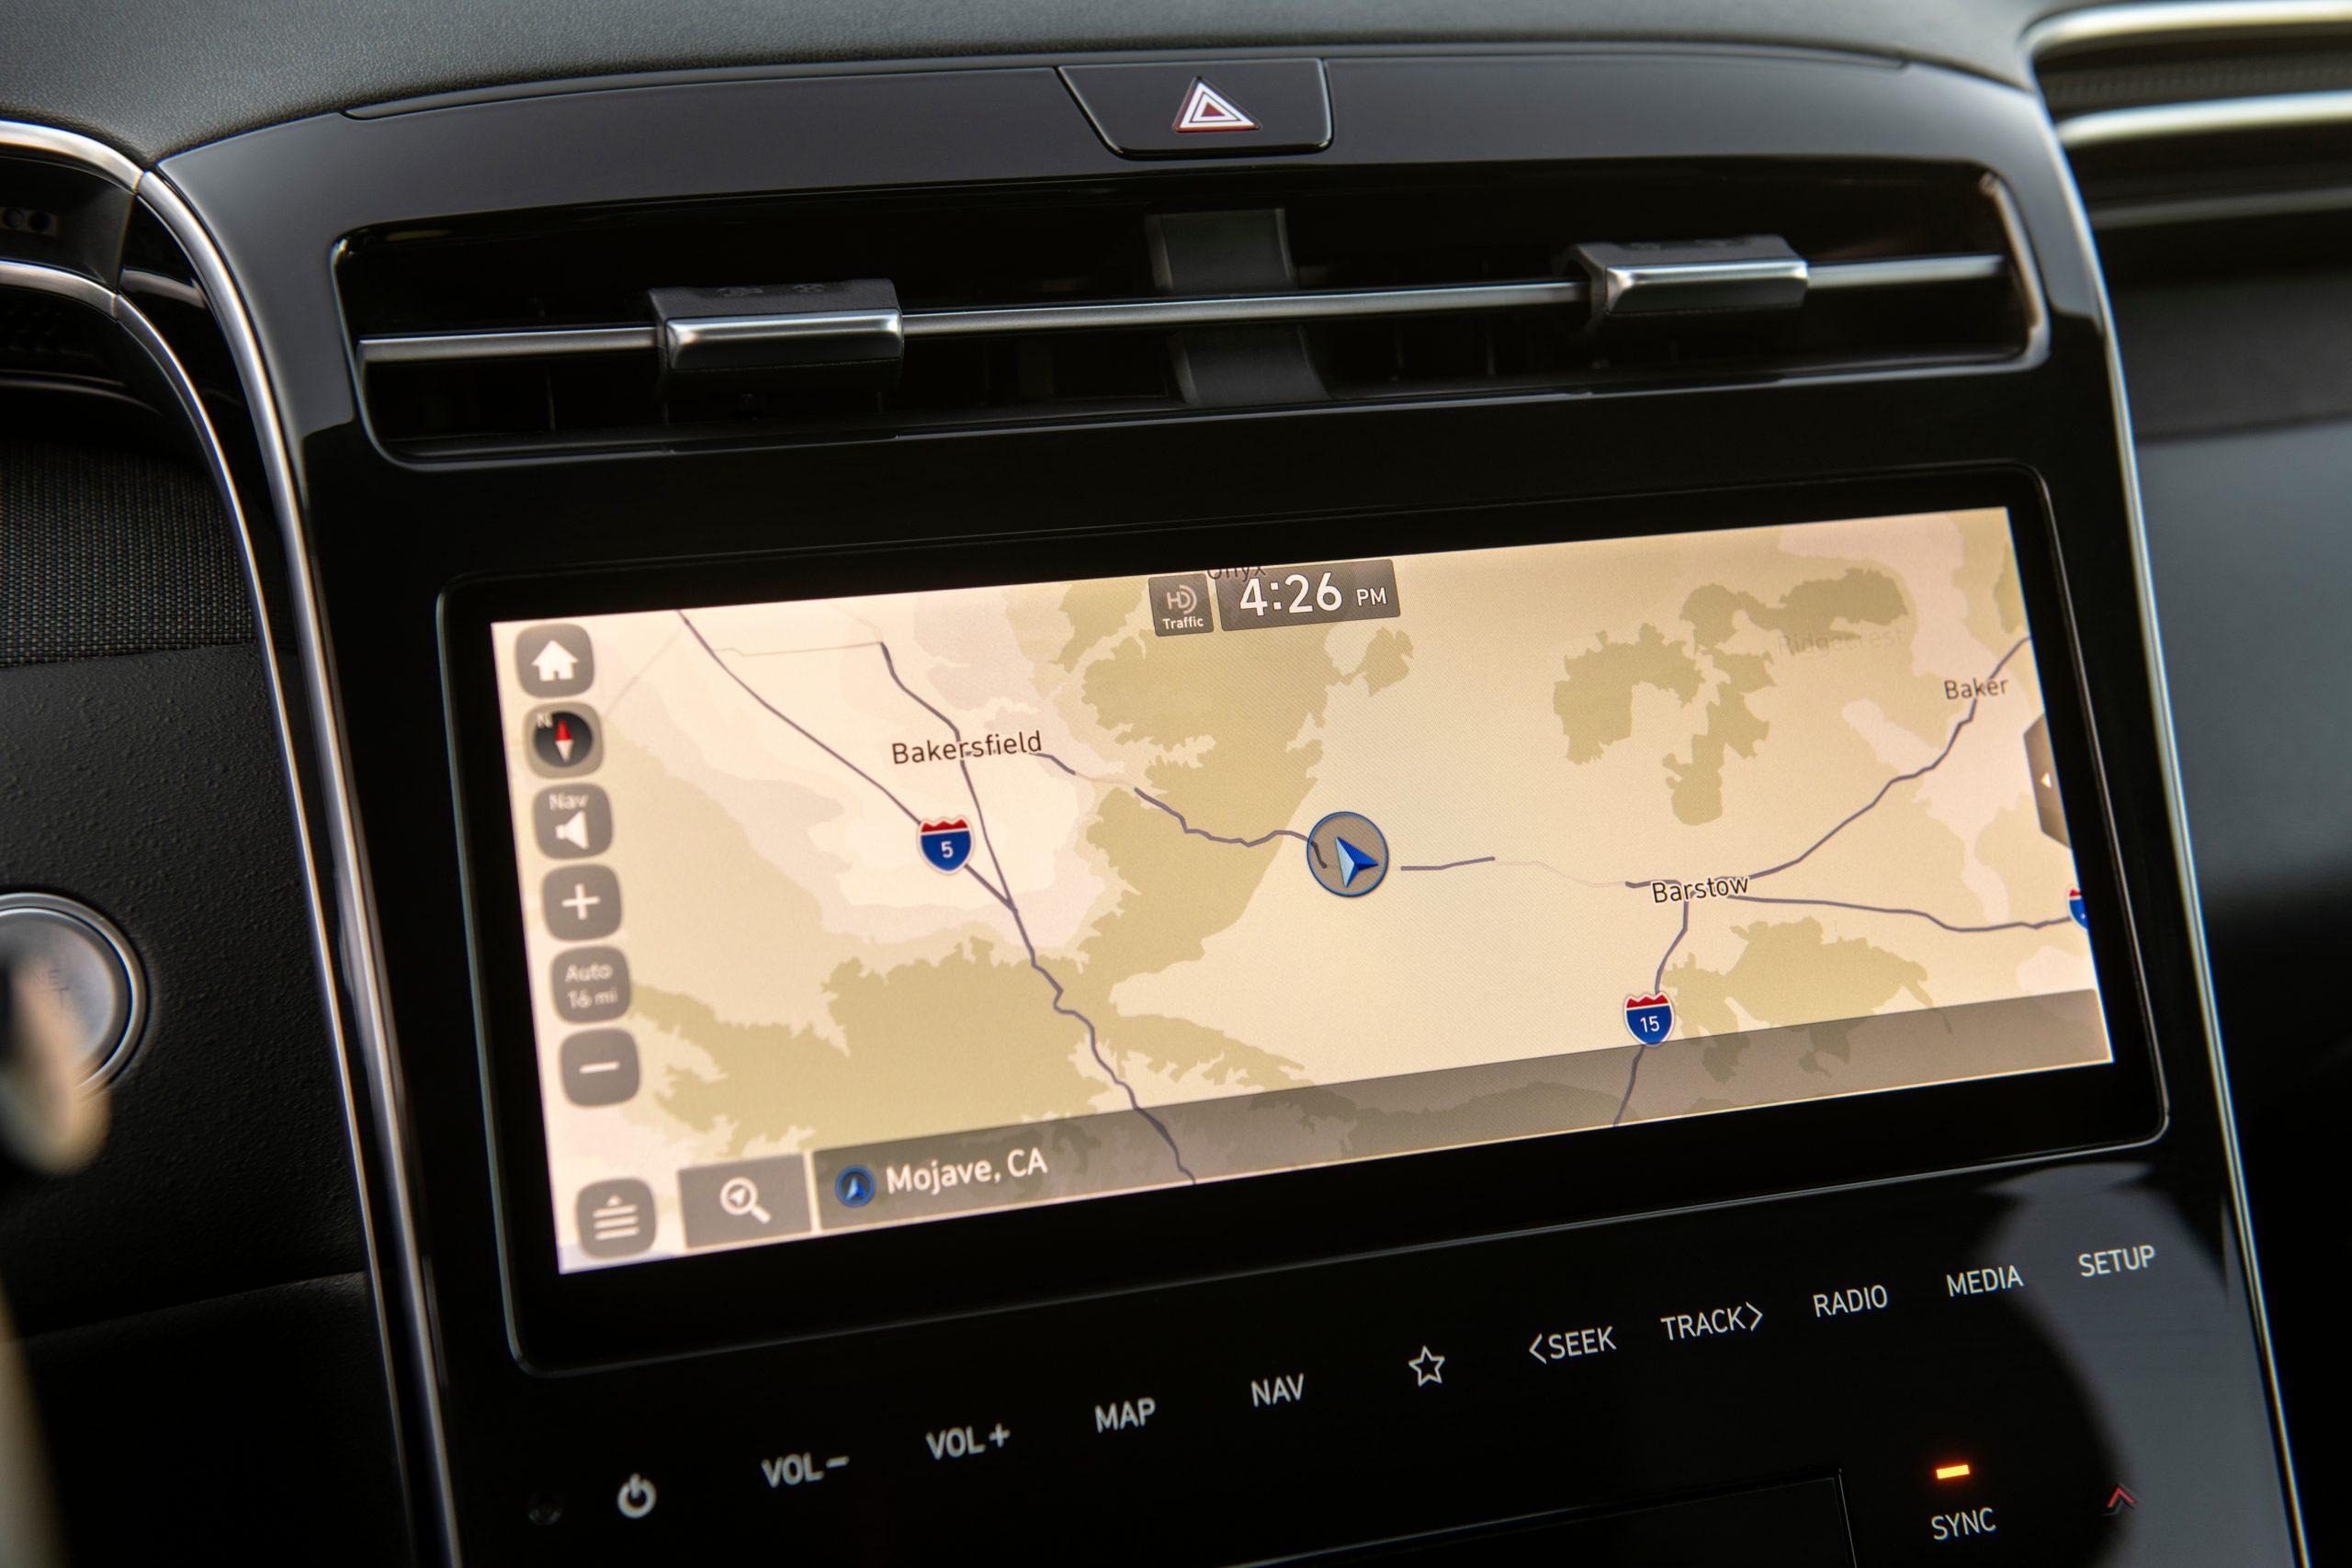 2022 Hyundai Santa Cruz Navigation screen